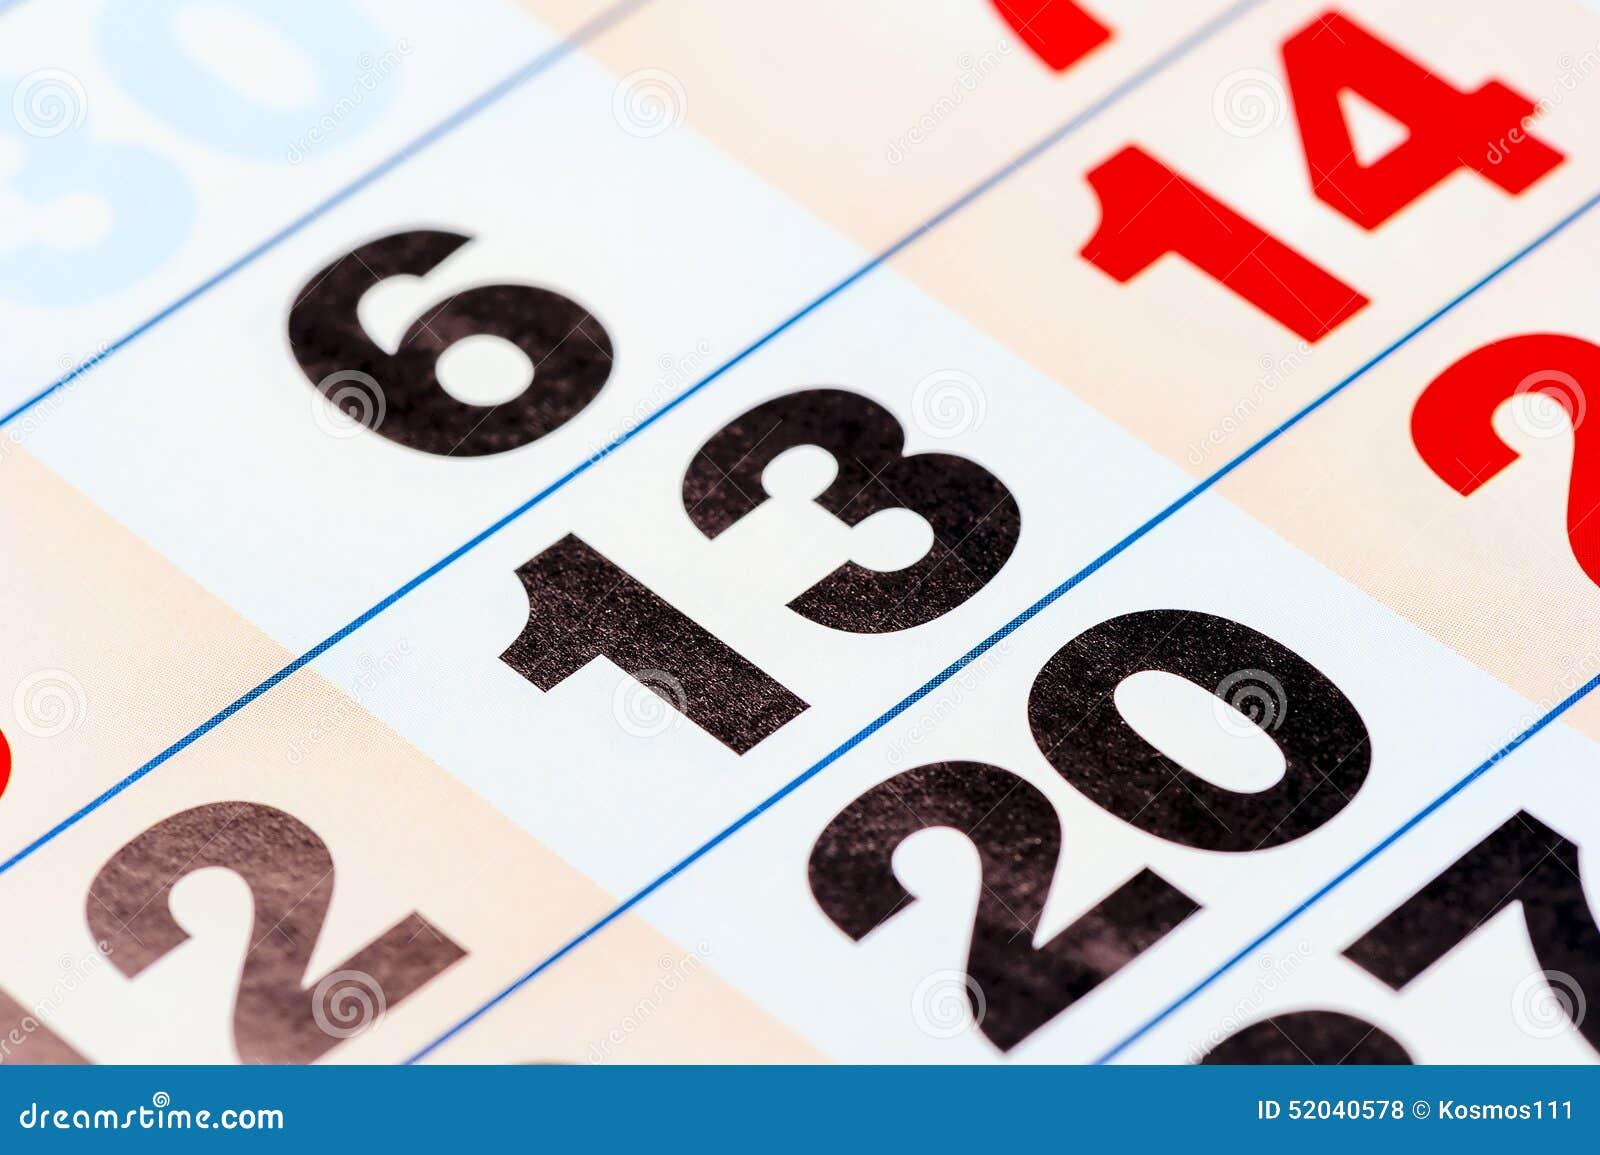 enablis business plan competition 2012 calendar